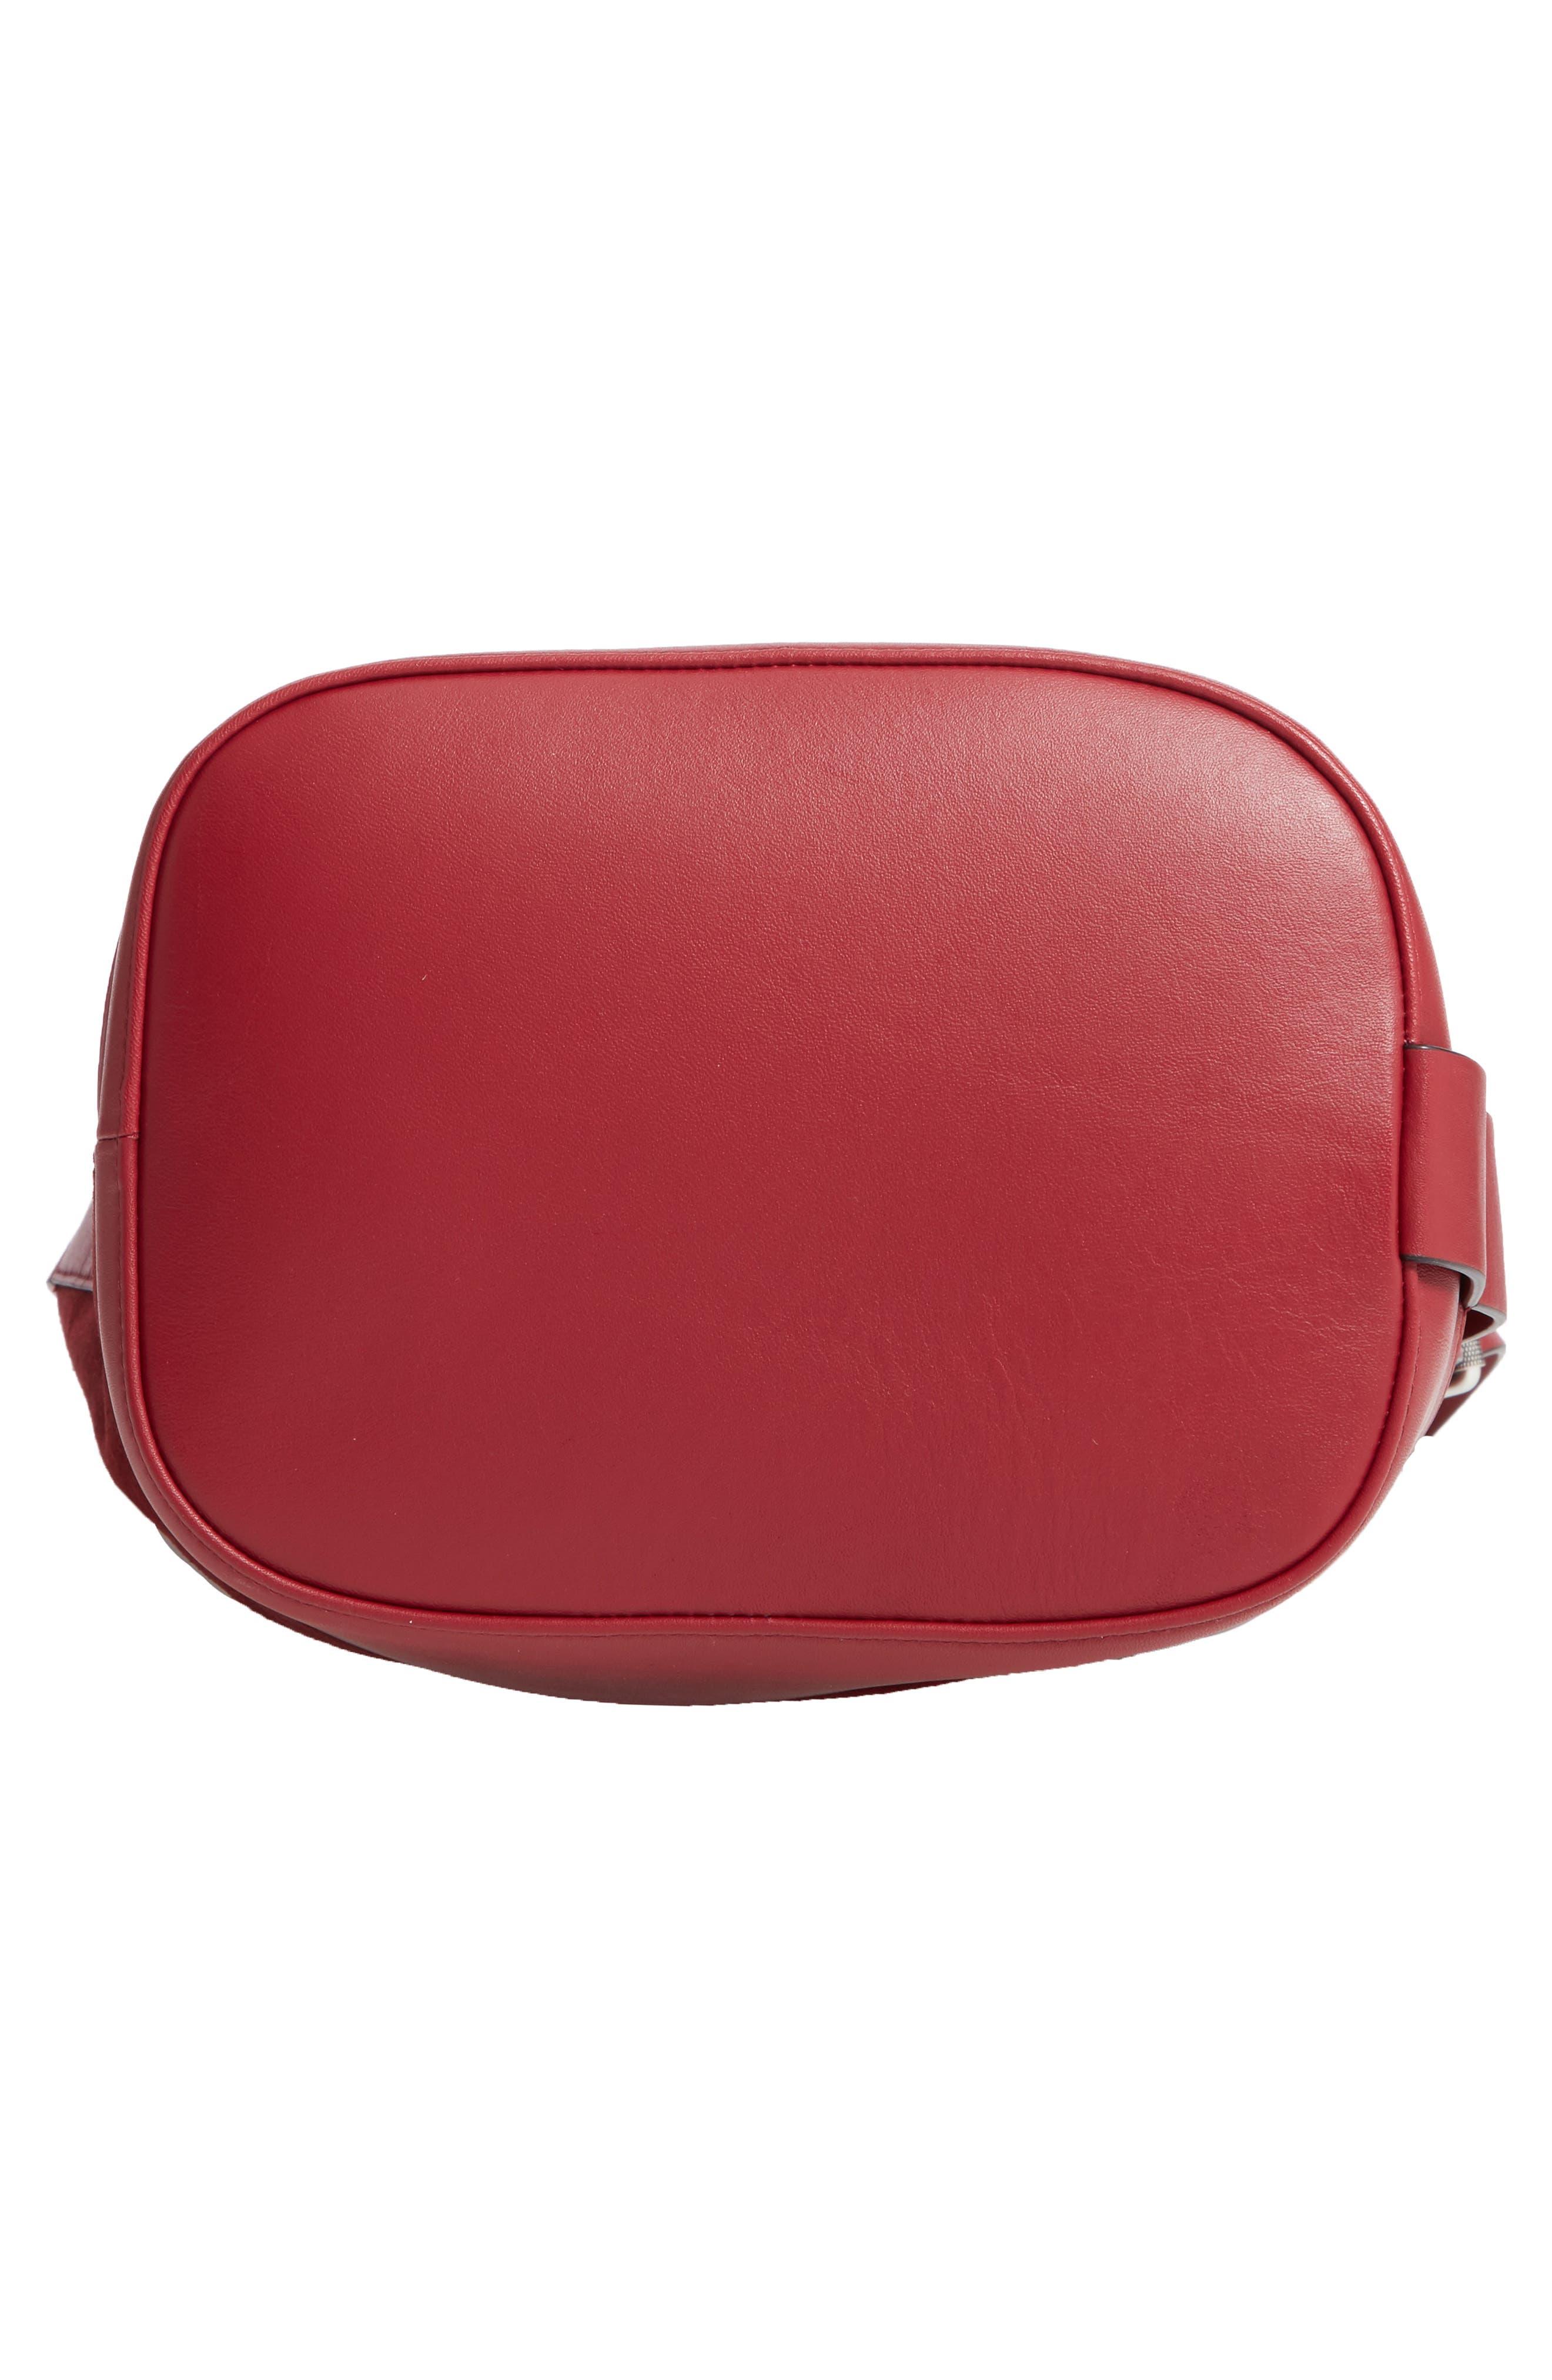 Walker Sling Suede Bucket Bag,                             Alternate thumbnail 7, color,                             BIKING RED MULTI